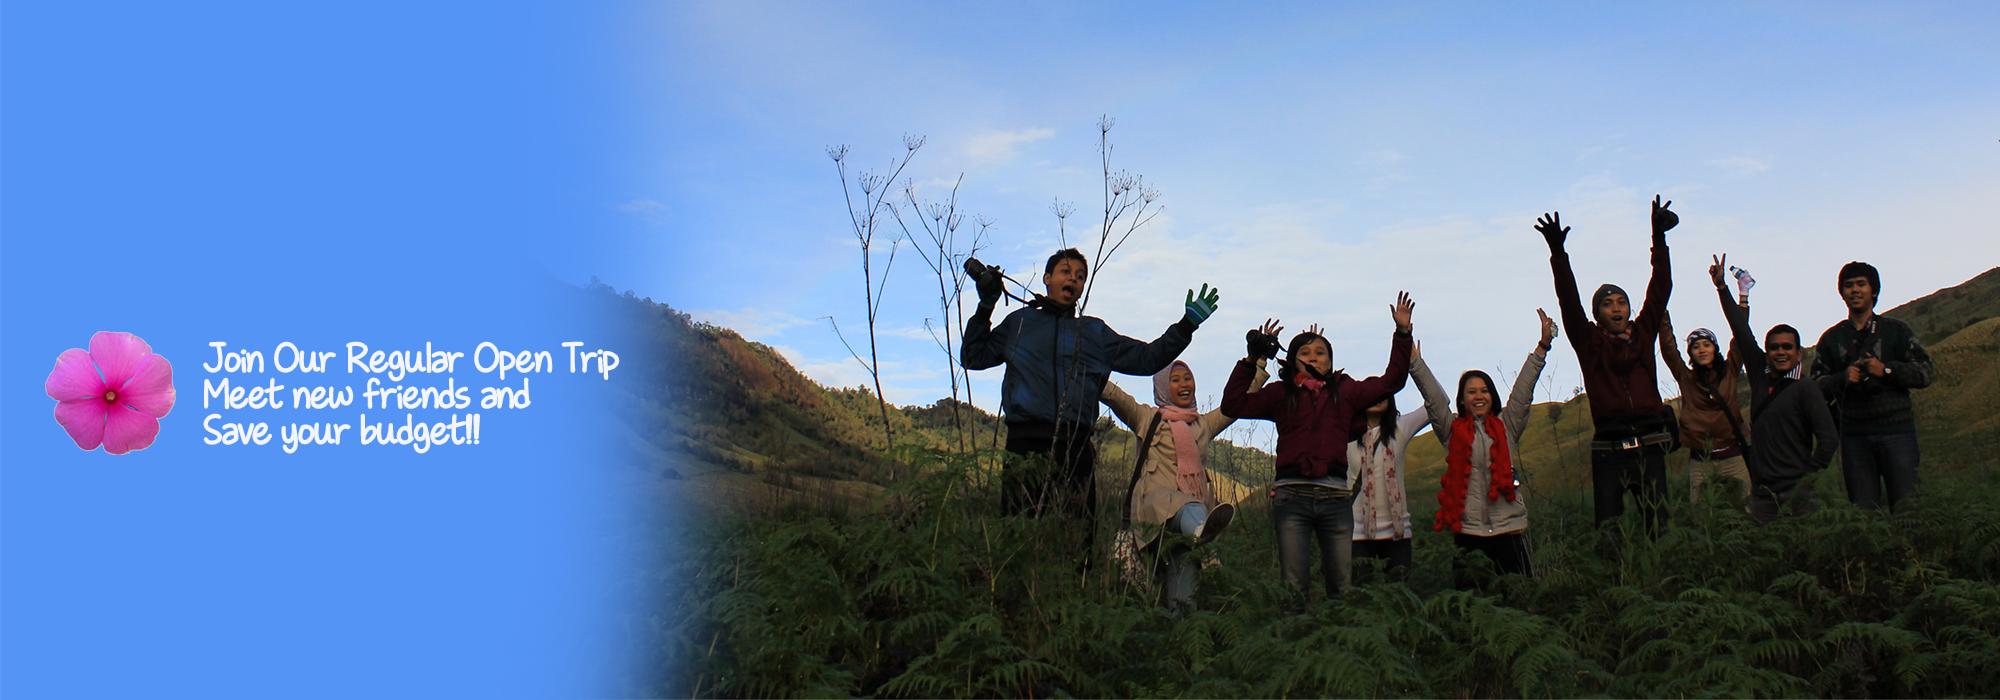 10992254696 499c221de6 o Keliling Nusantara   Jadwal Open Trip Event Tahun 2014